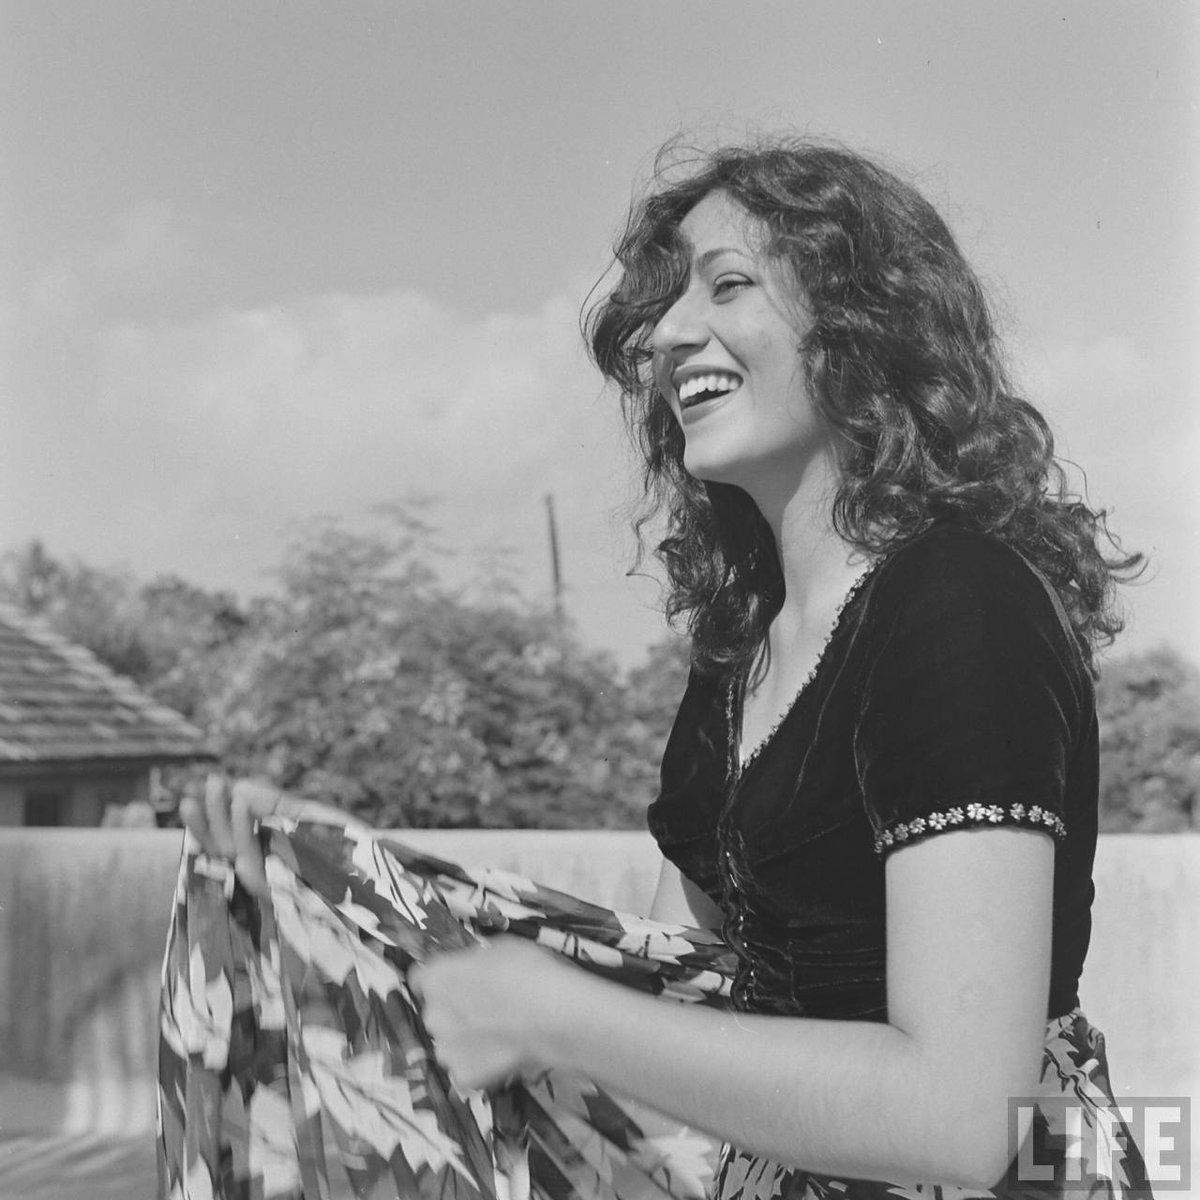 Barbara Magnolfi